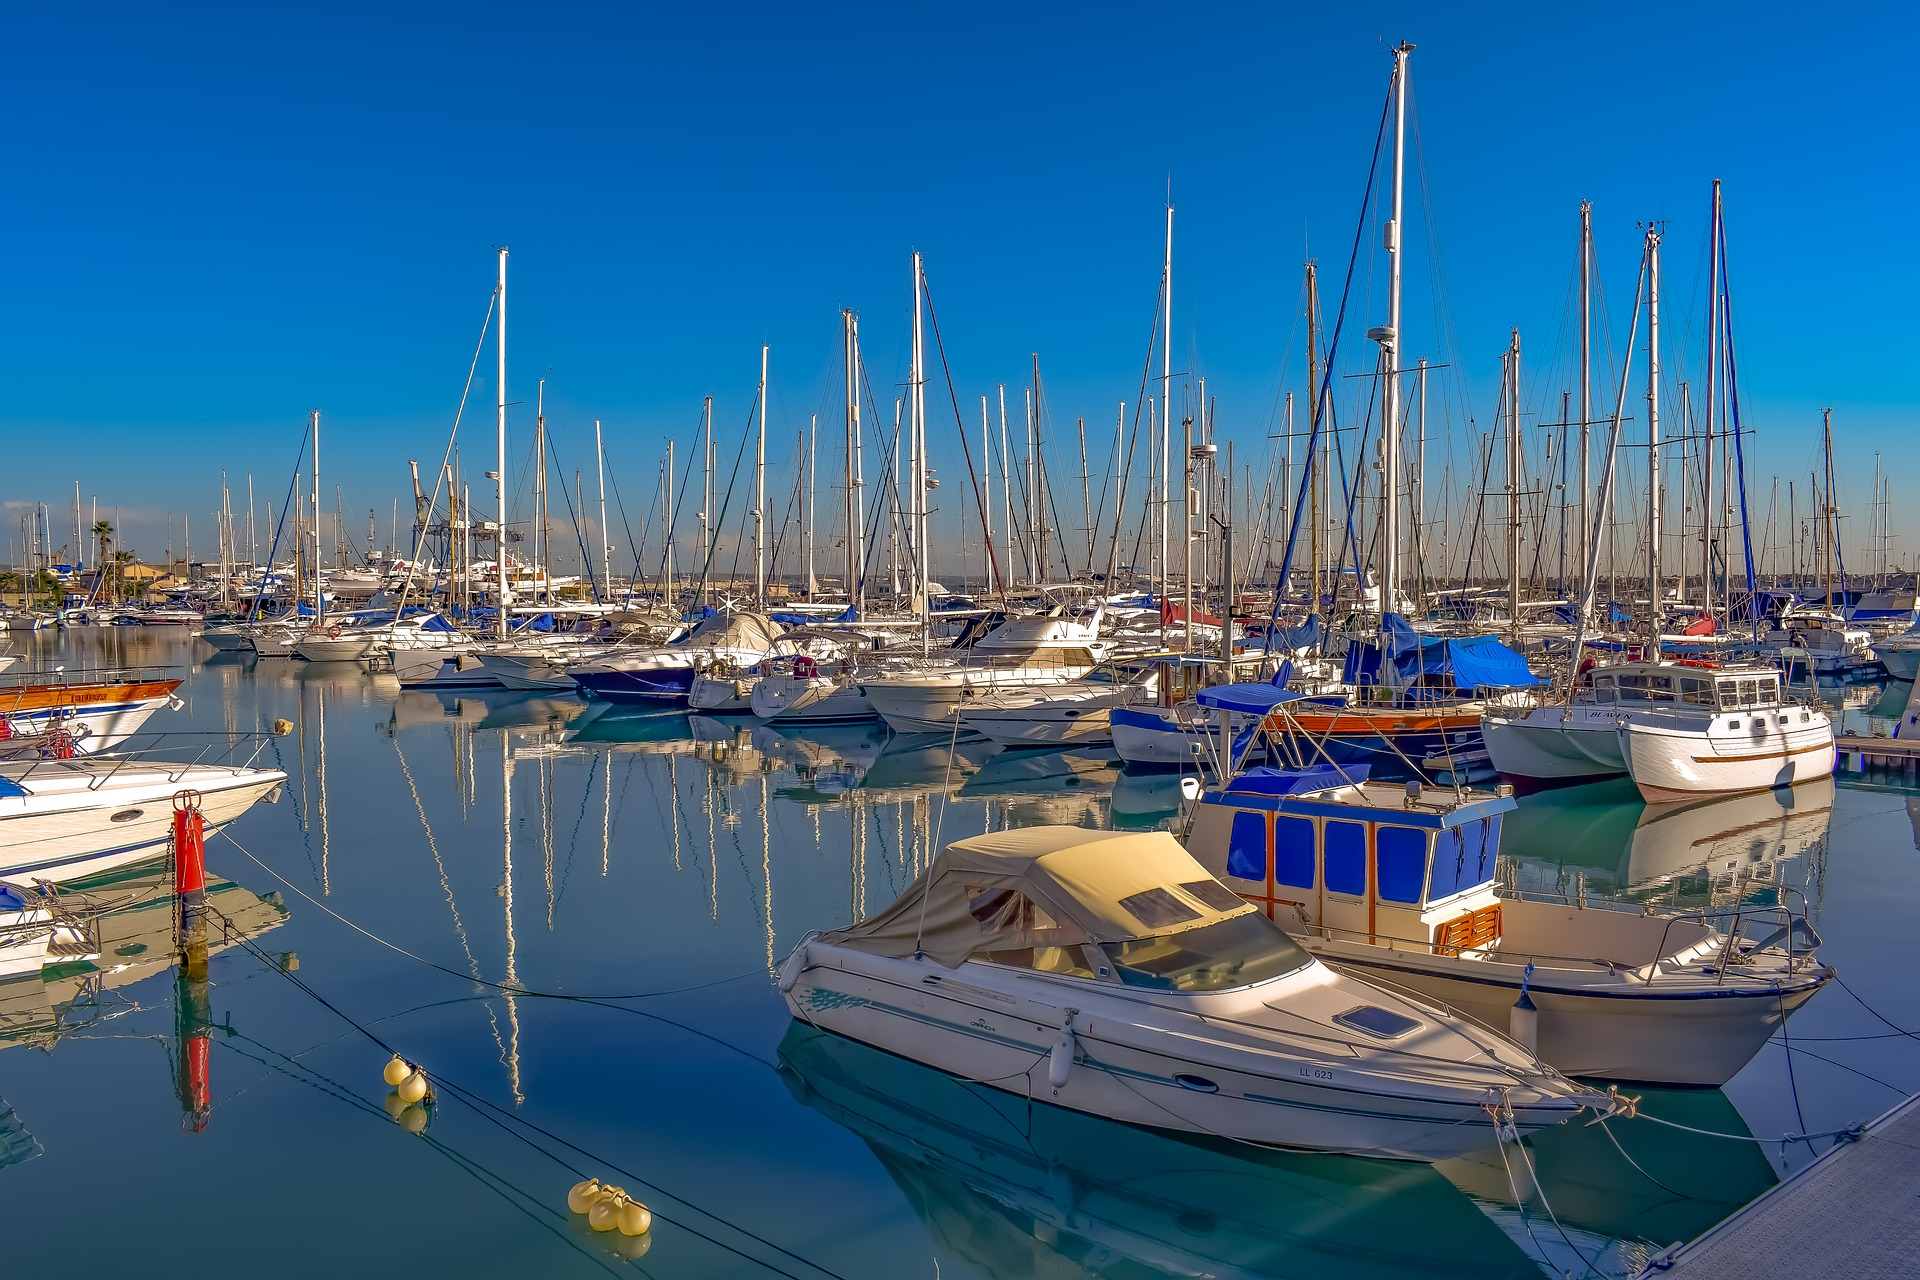 Marina Boats | GWcars.org